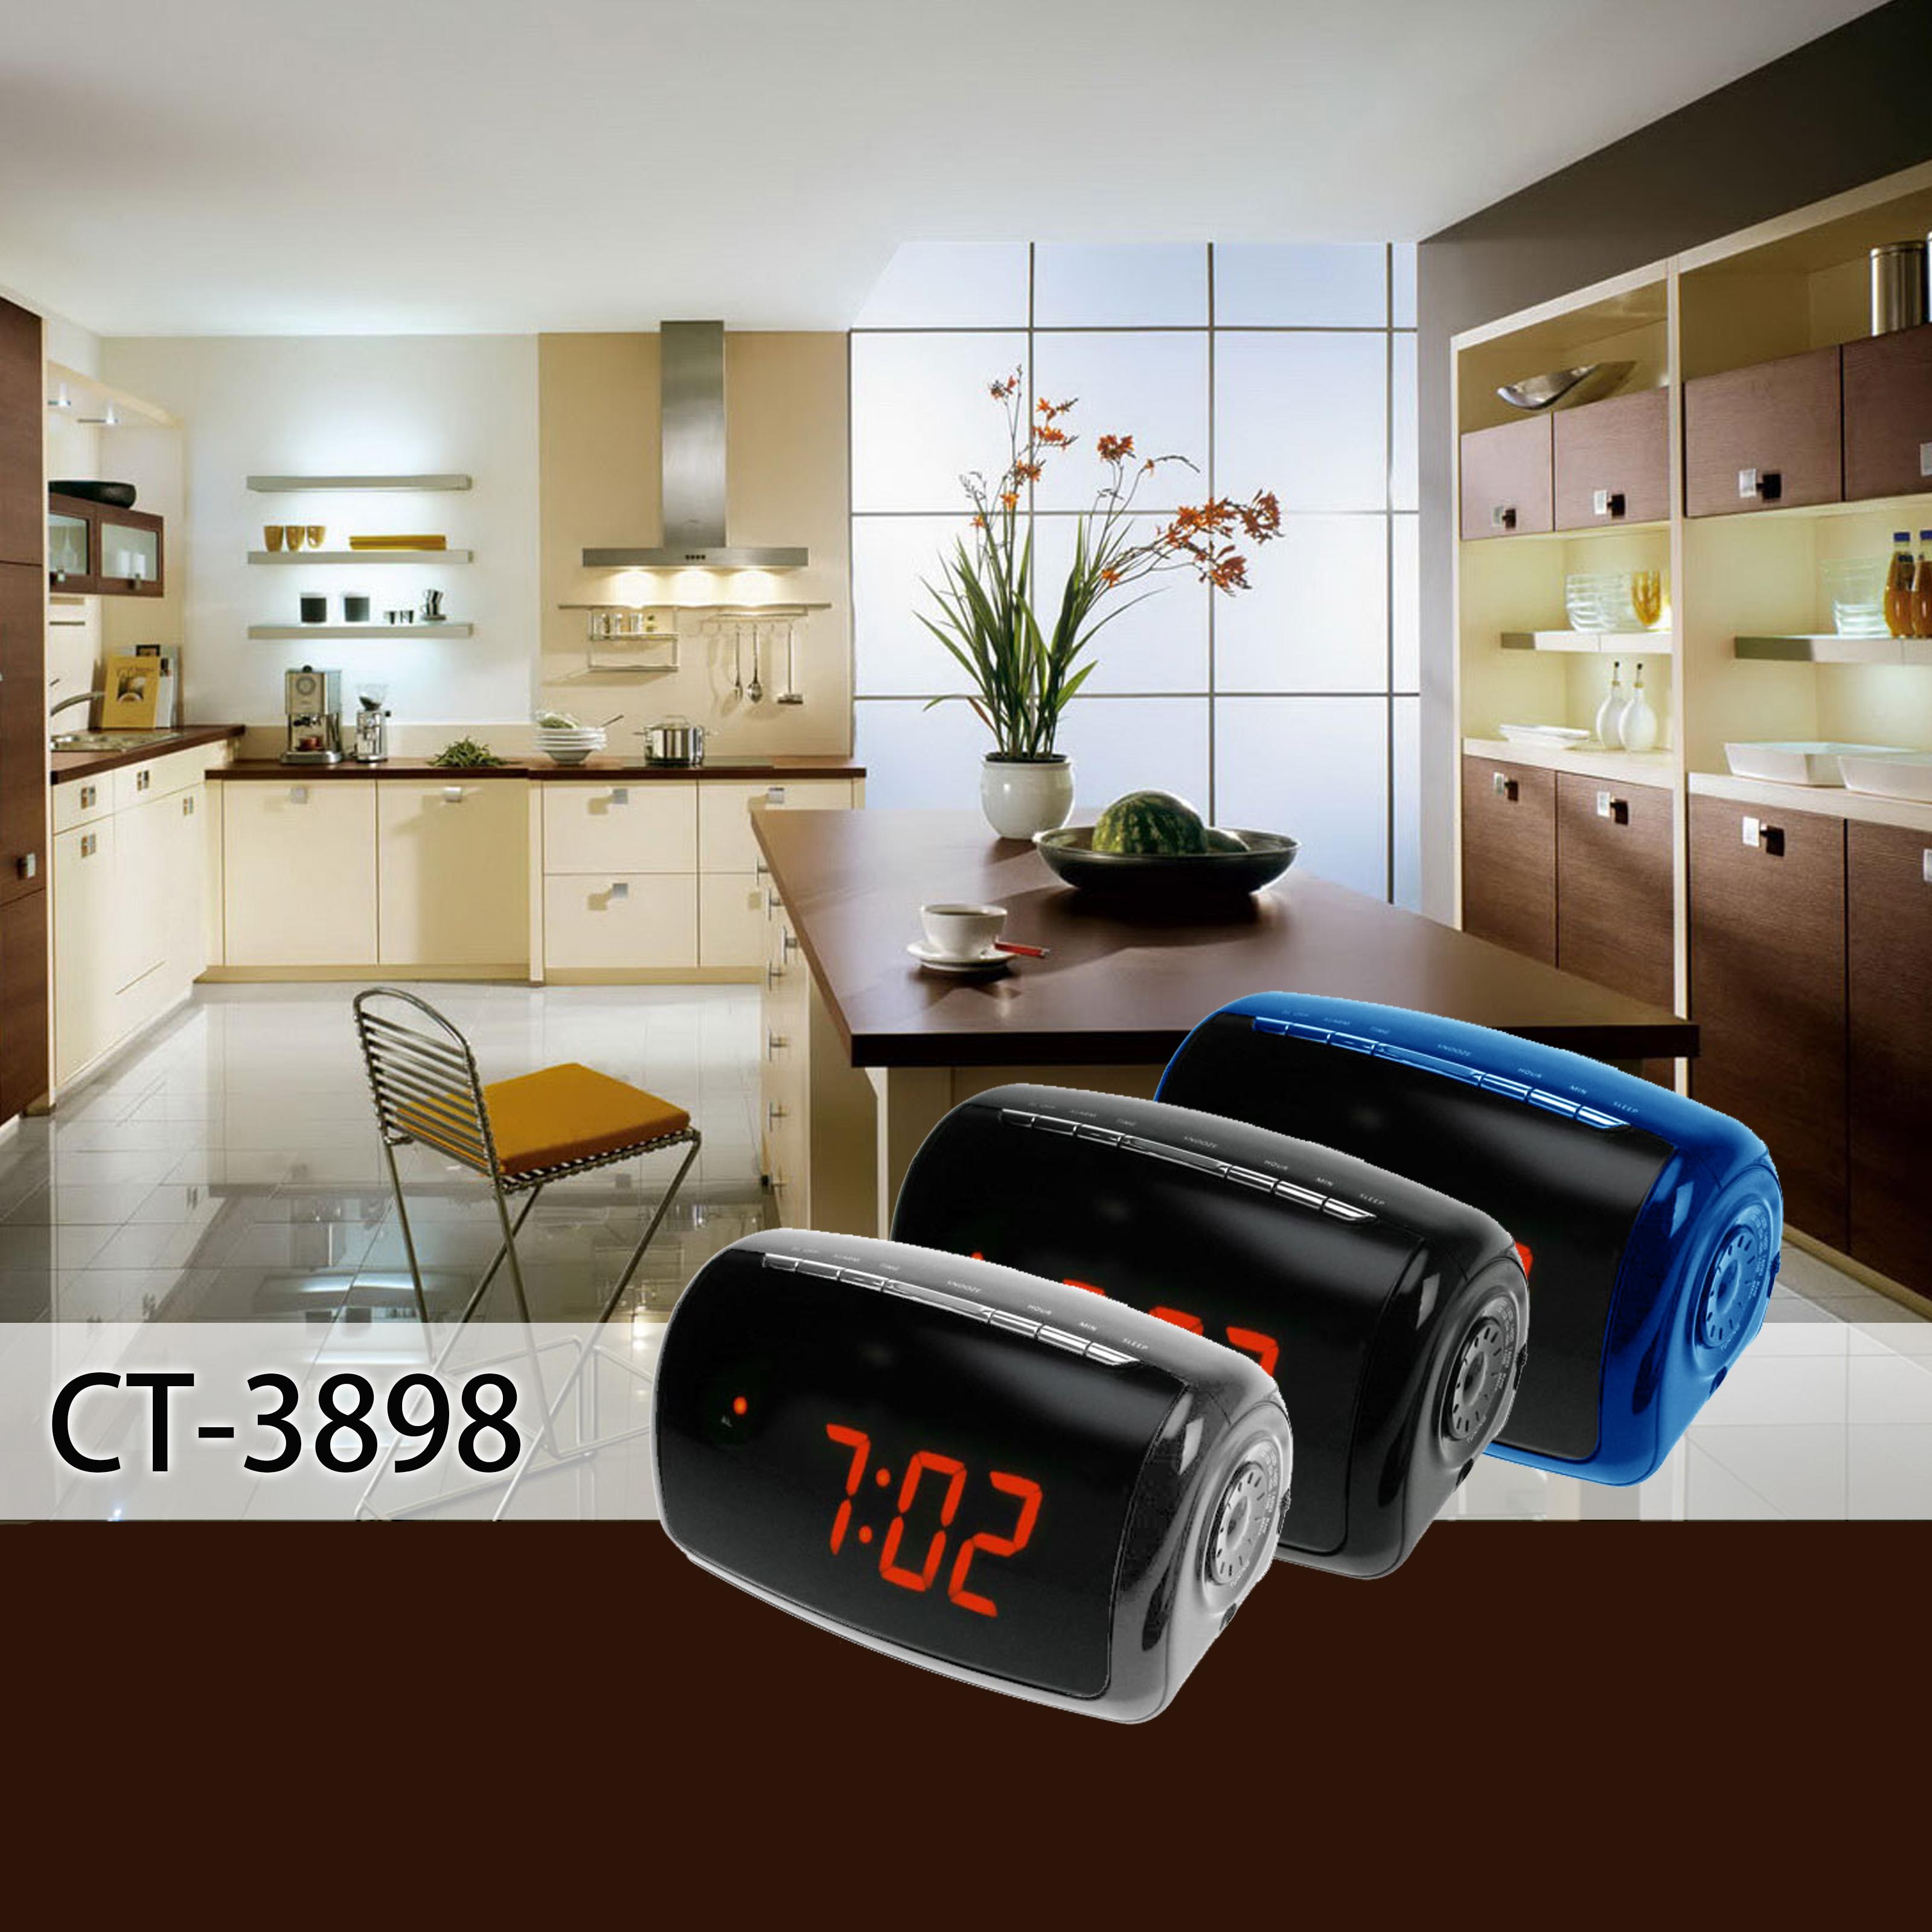 CT-3898 dining.jpg